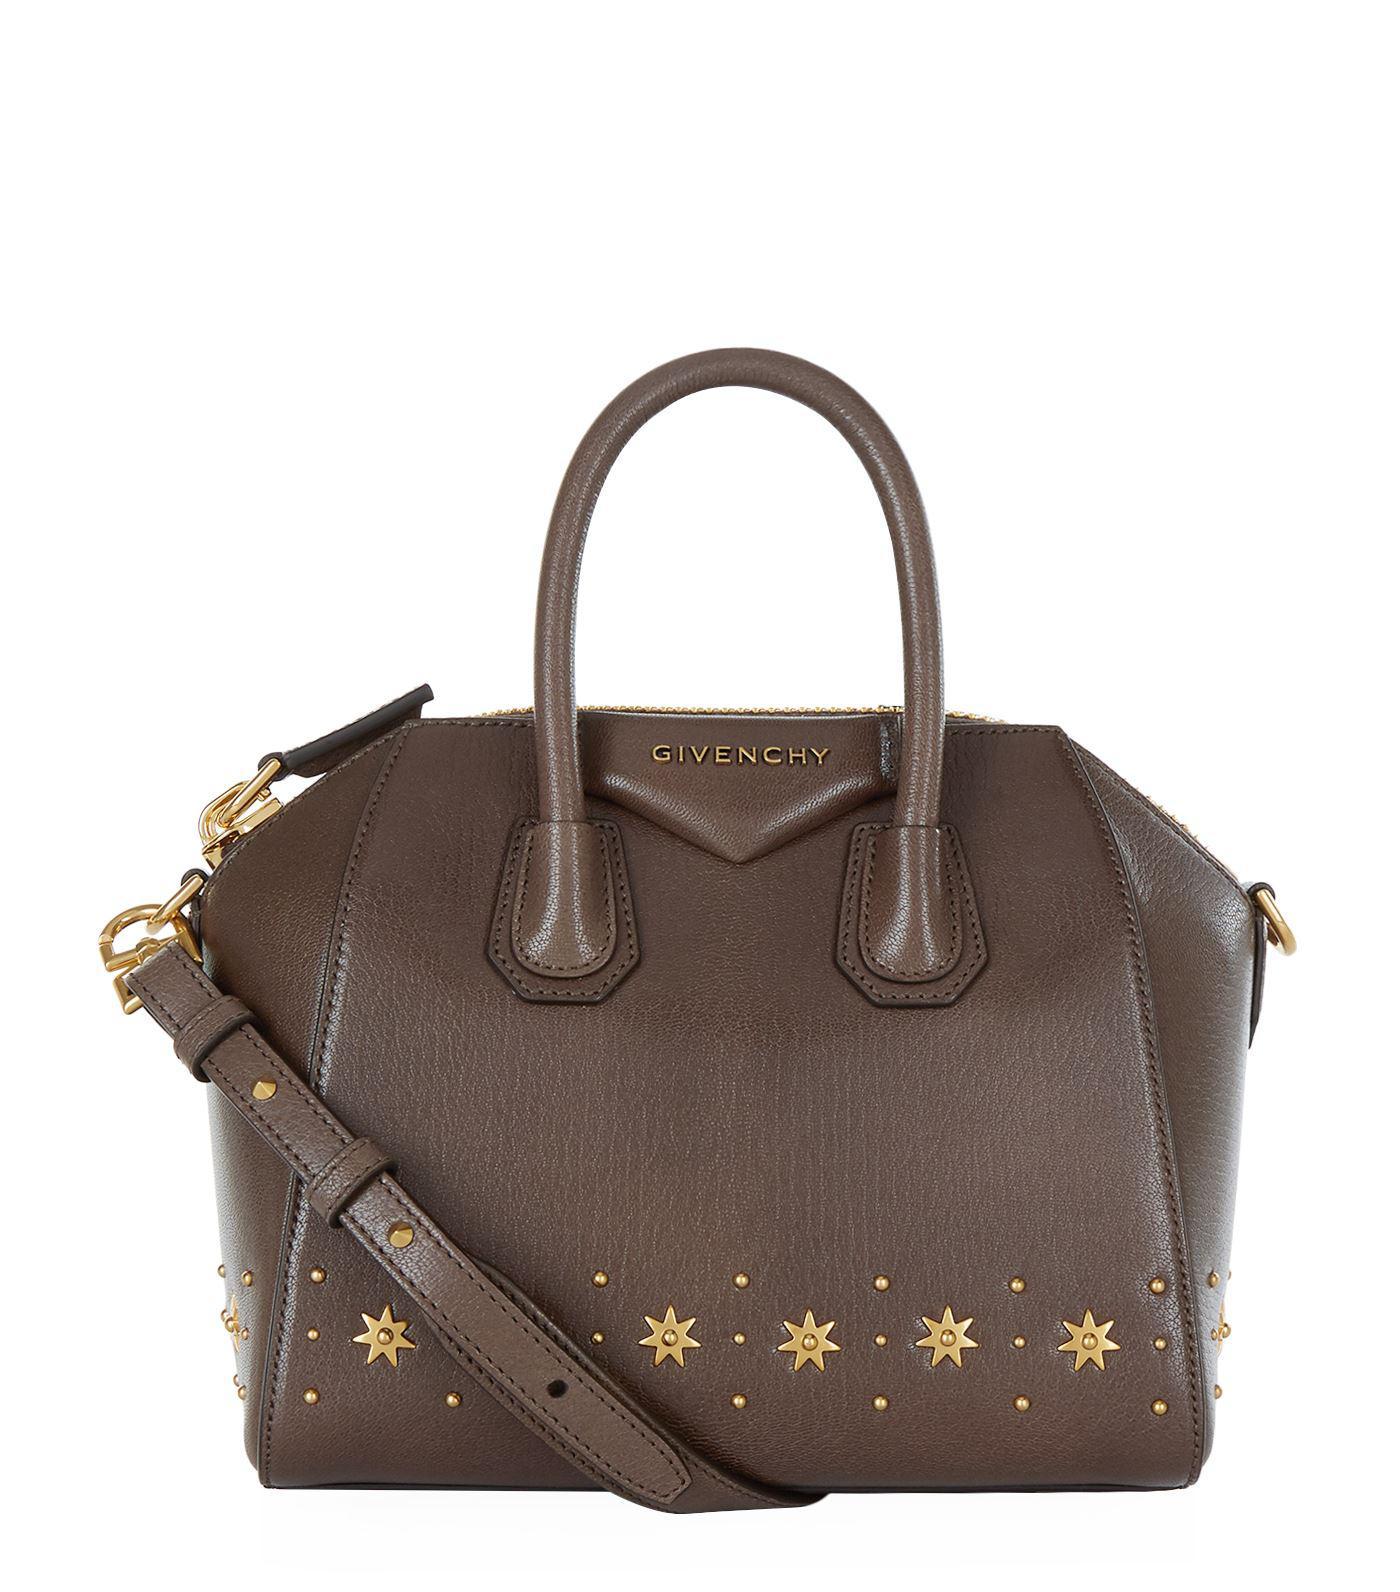 a15c21dc60 Givenchy - Gray Small Star Antigona Tote Bag - Lyst. View fullscreen